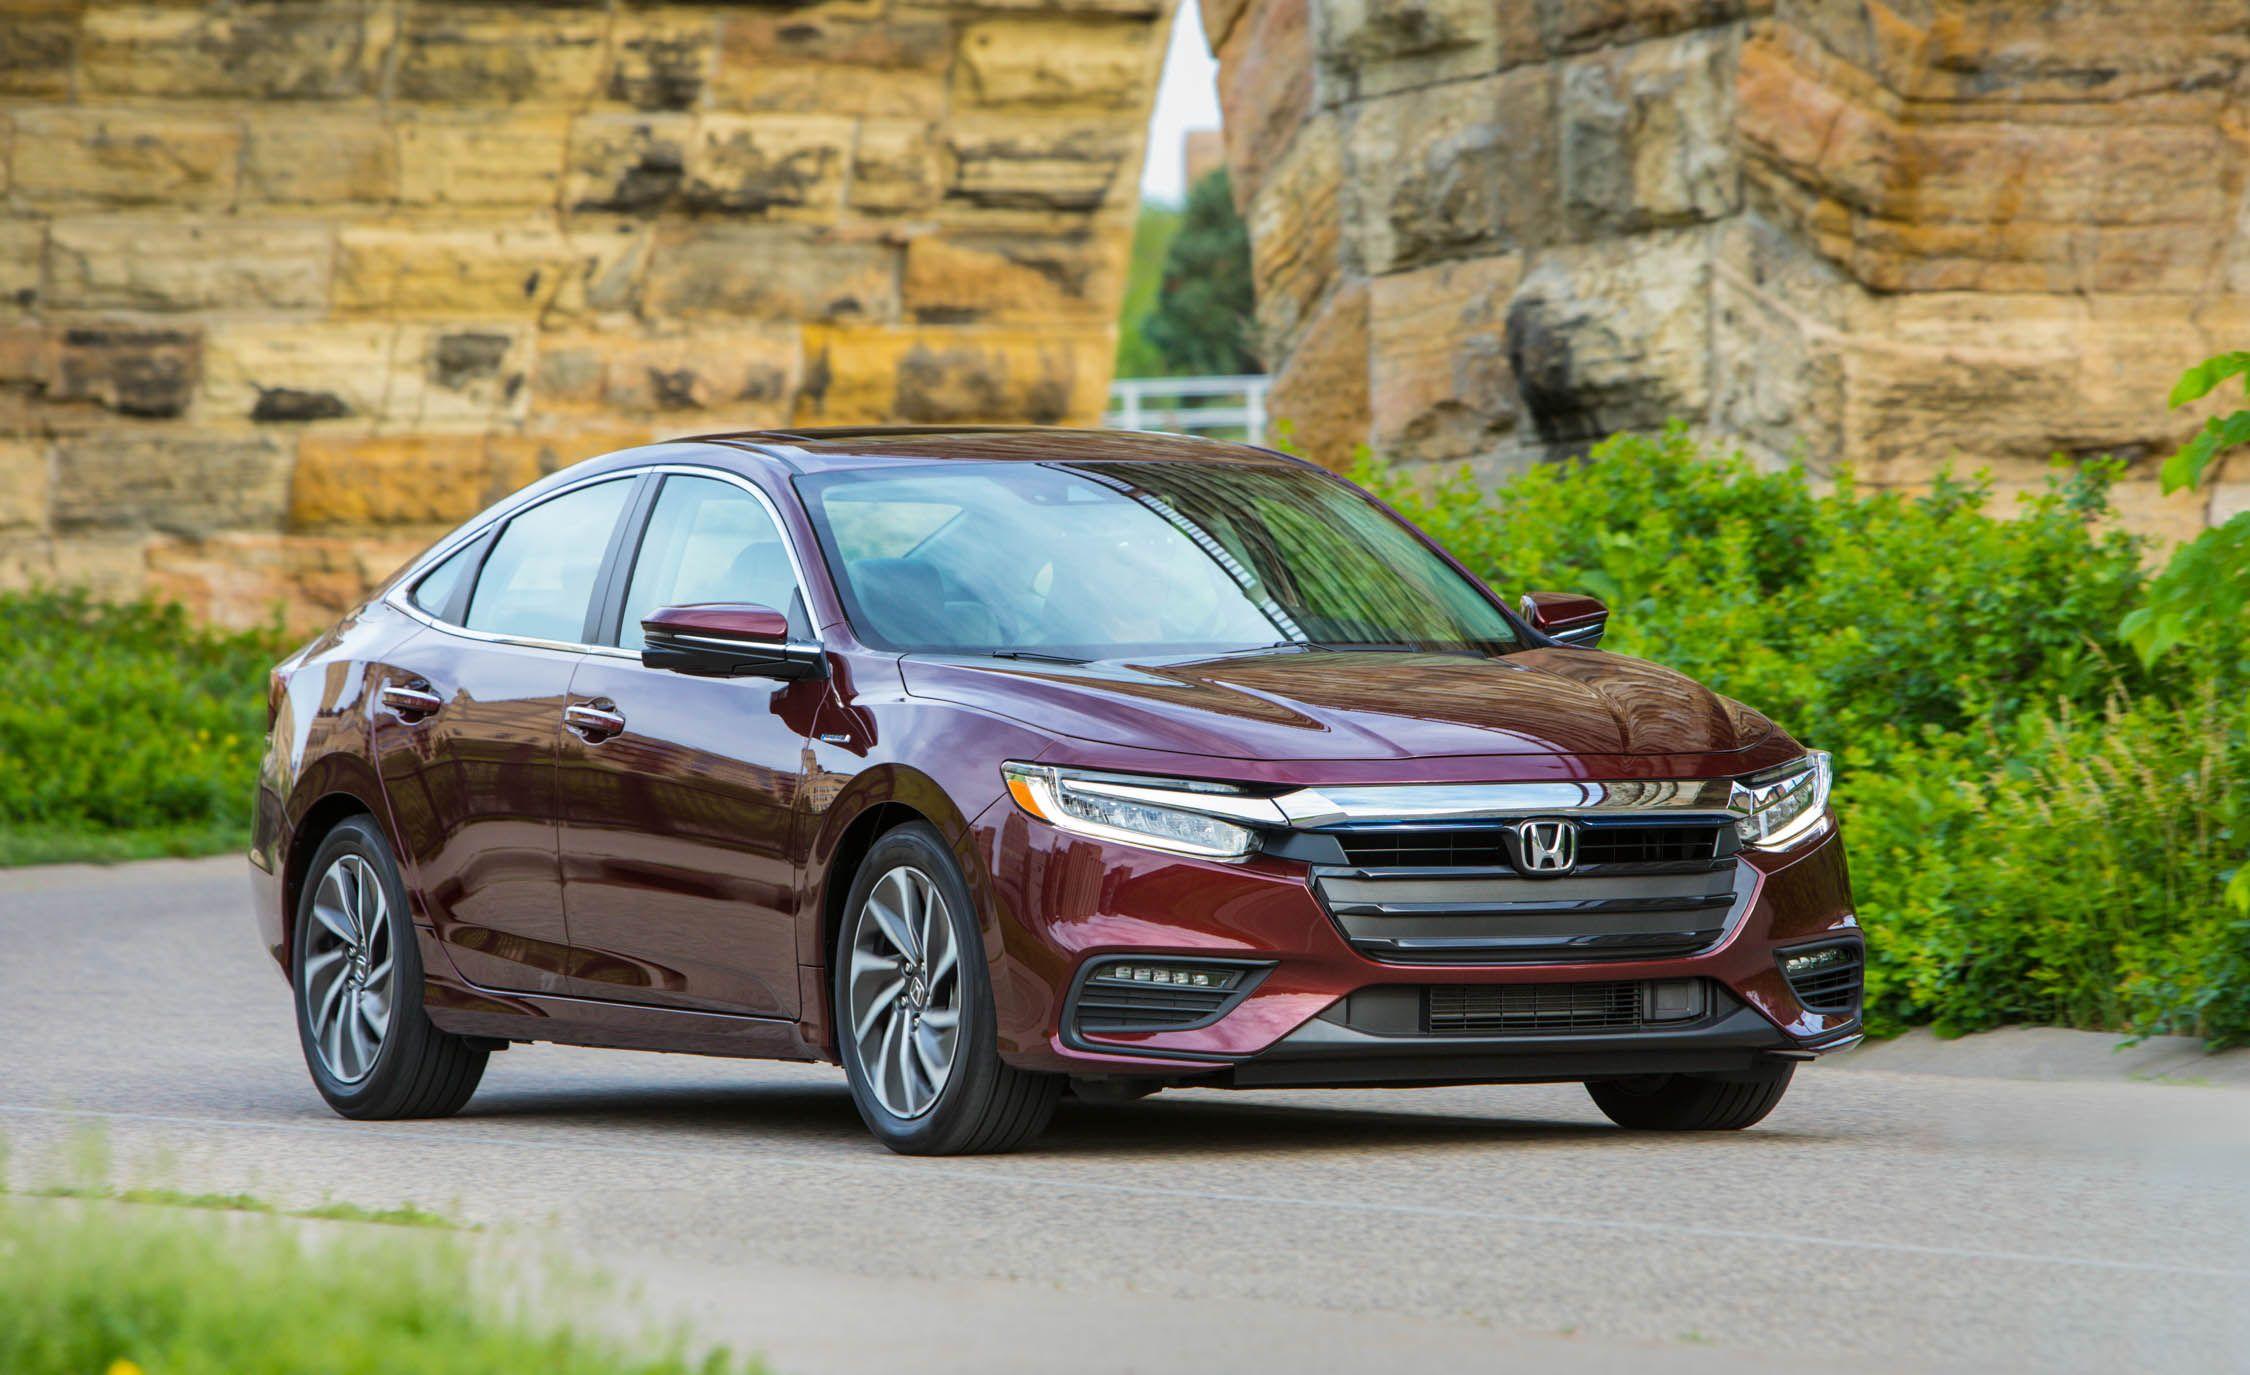 2019 Honda Insight Hybrid Prices Start Under 24 000 News Car And Driver